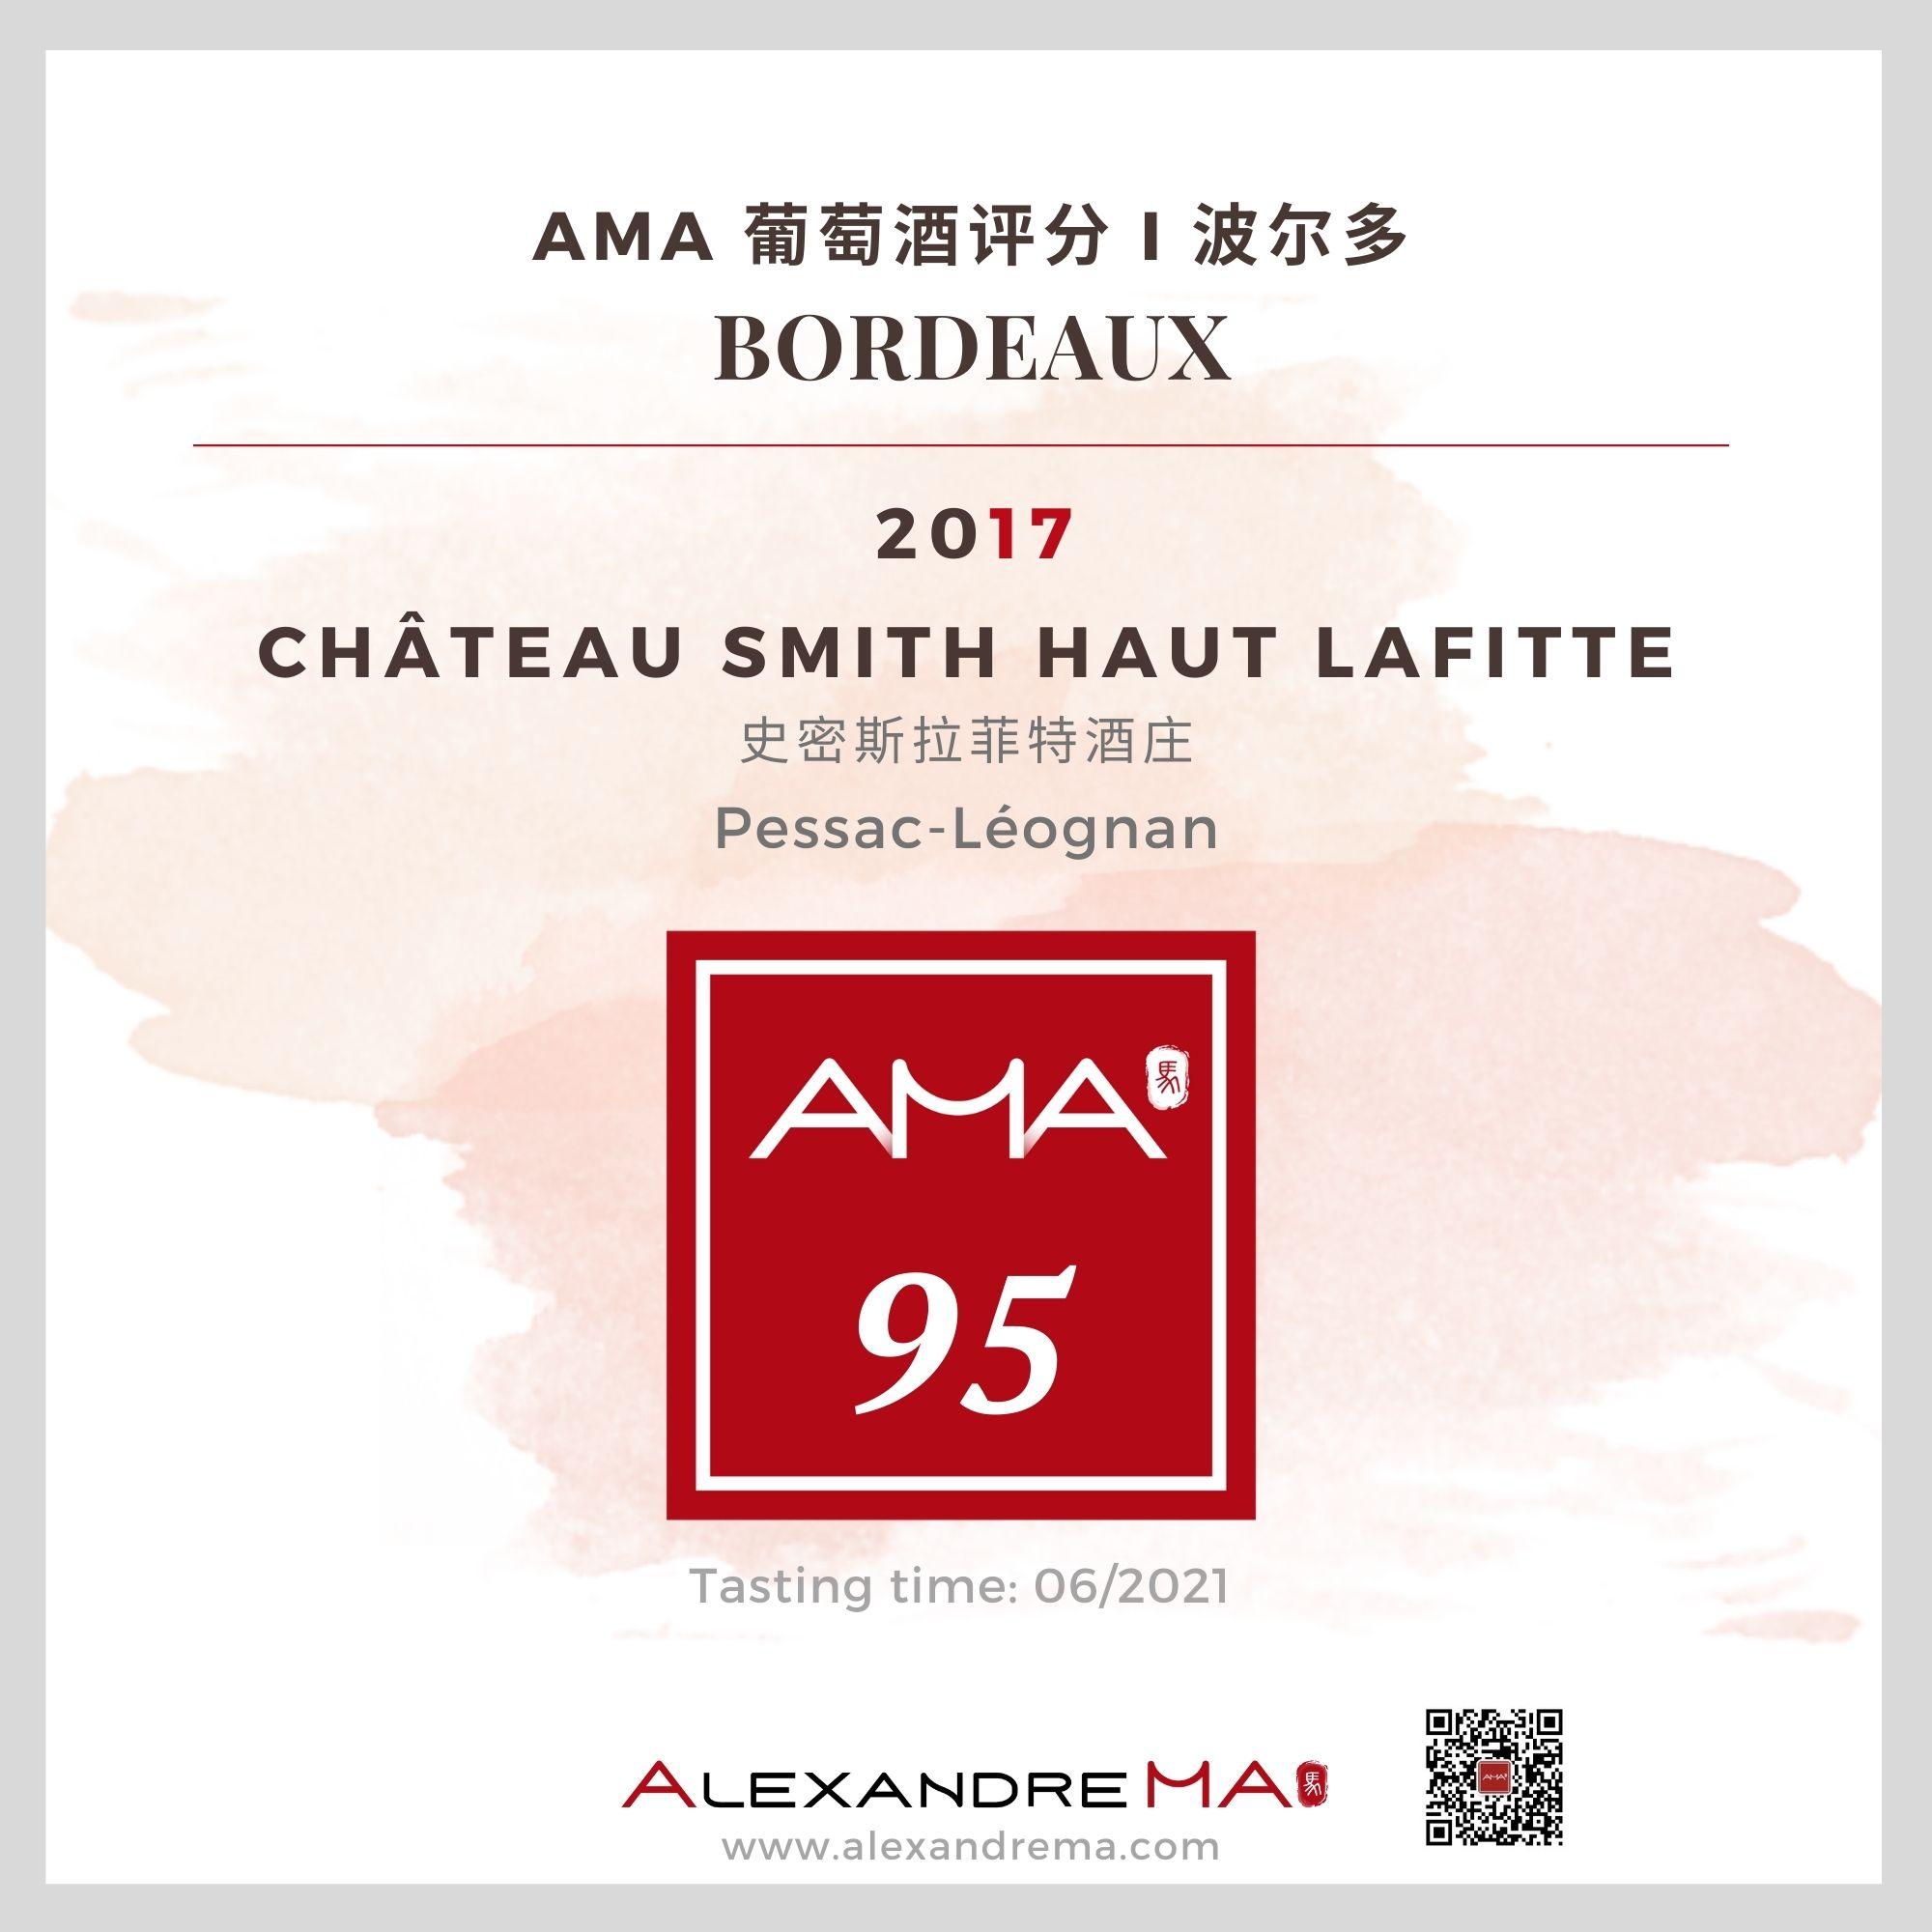 Château Smith Haut Lafitte 2017 史密斯拉菲特酒庄 - Alexandre Ma